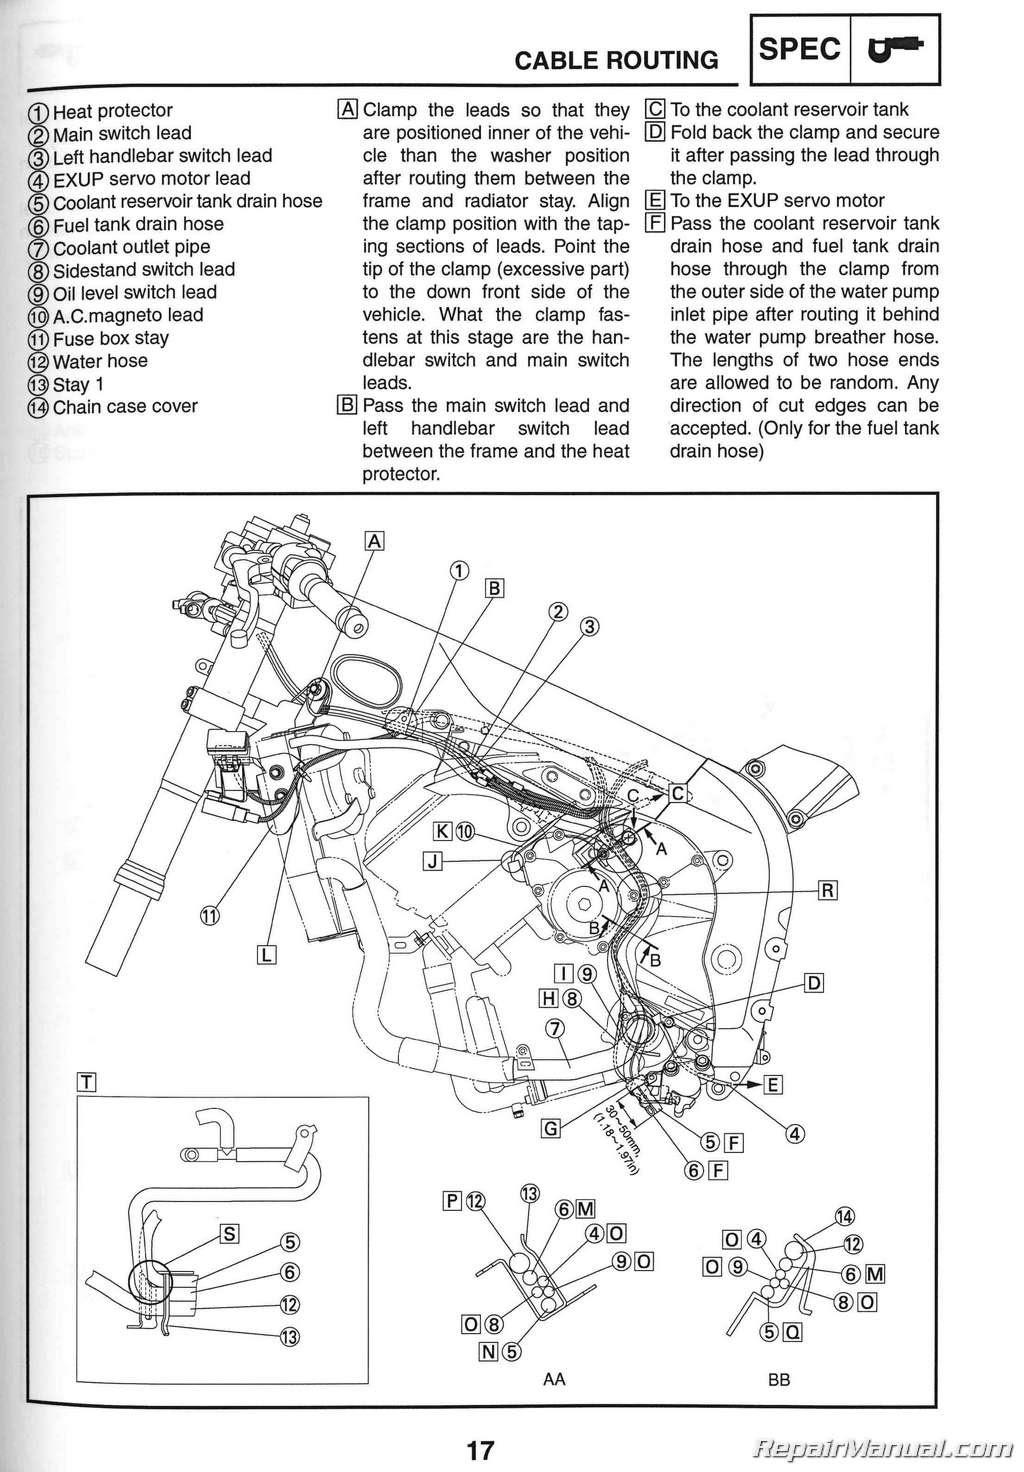 Diagram 1999 Yamaha R1 Wiring Diagram Full Version Hd Quality Wiring Diagram Corediagram Efran It